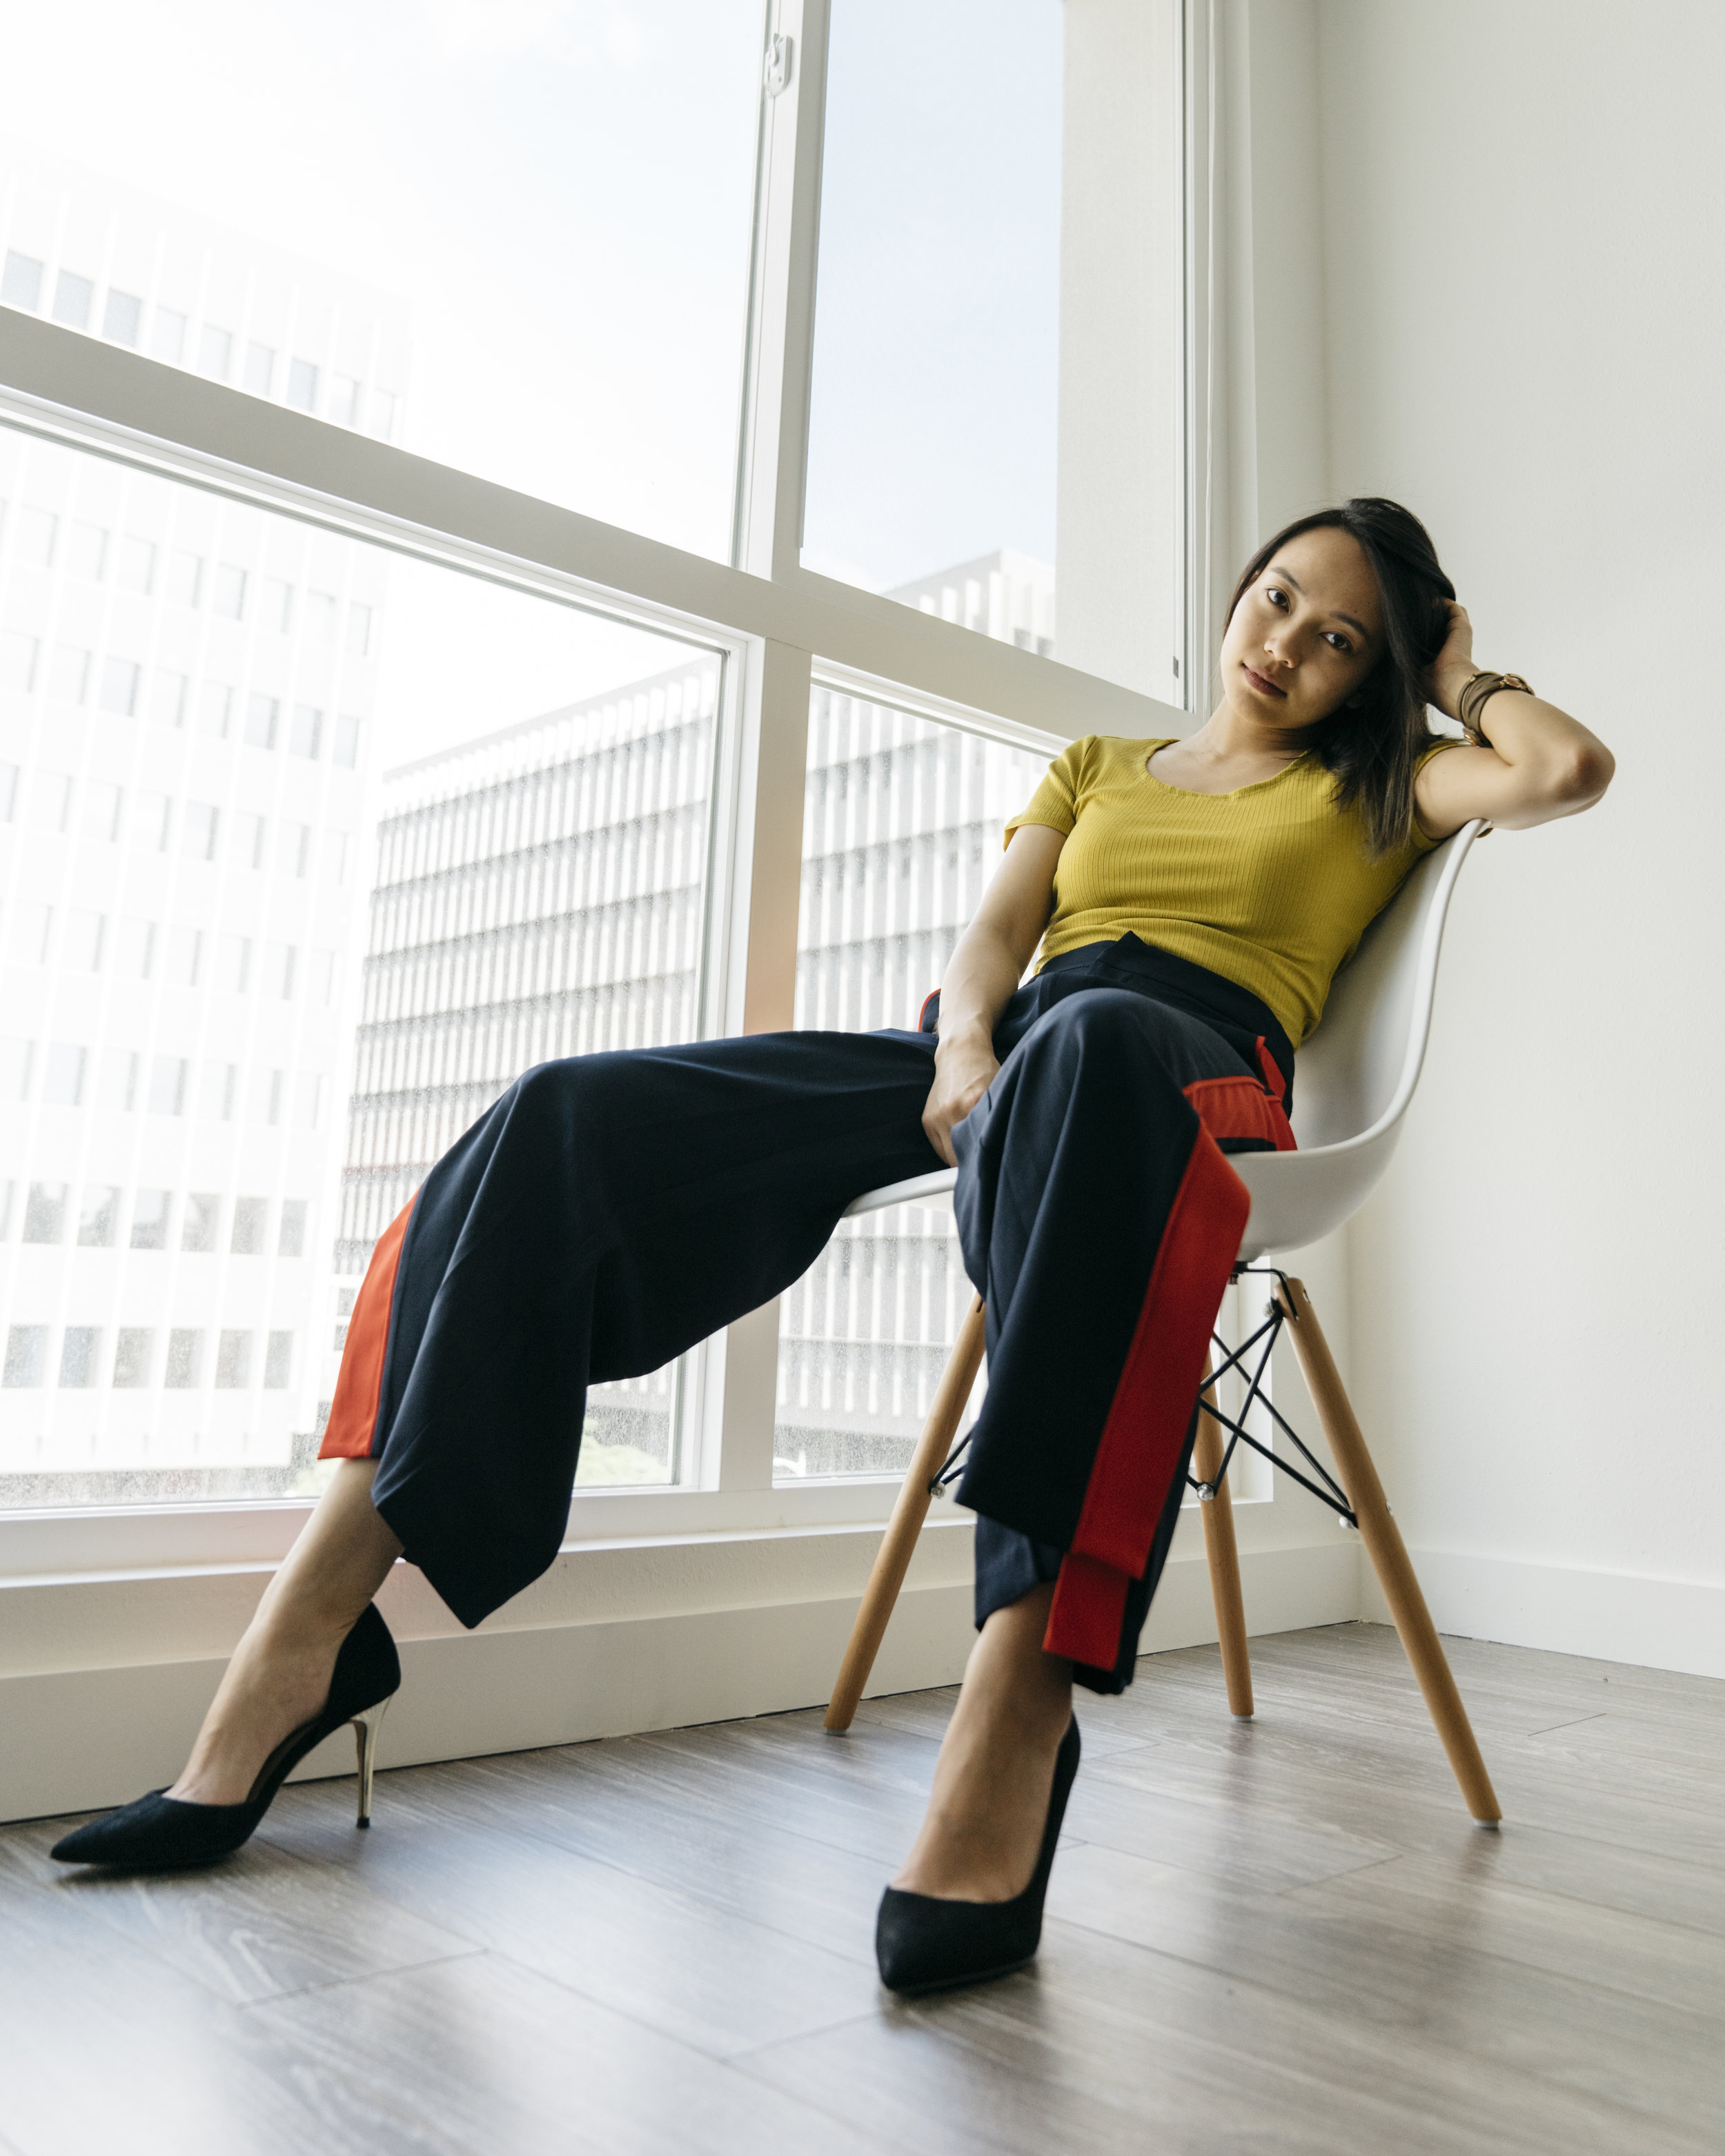 hey-yeh-pomelo-fashion-womens-month-01.jpg